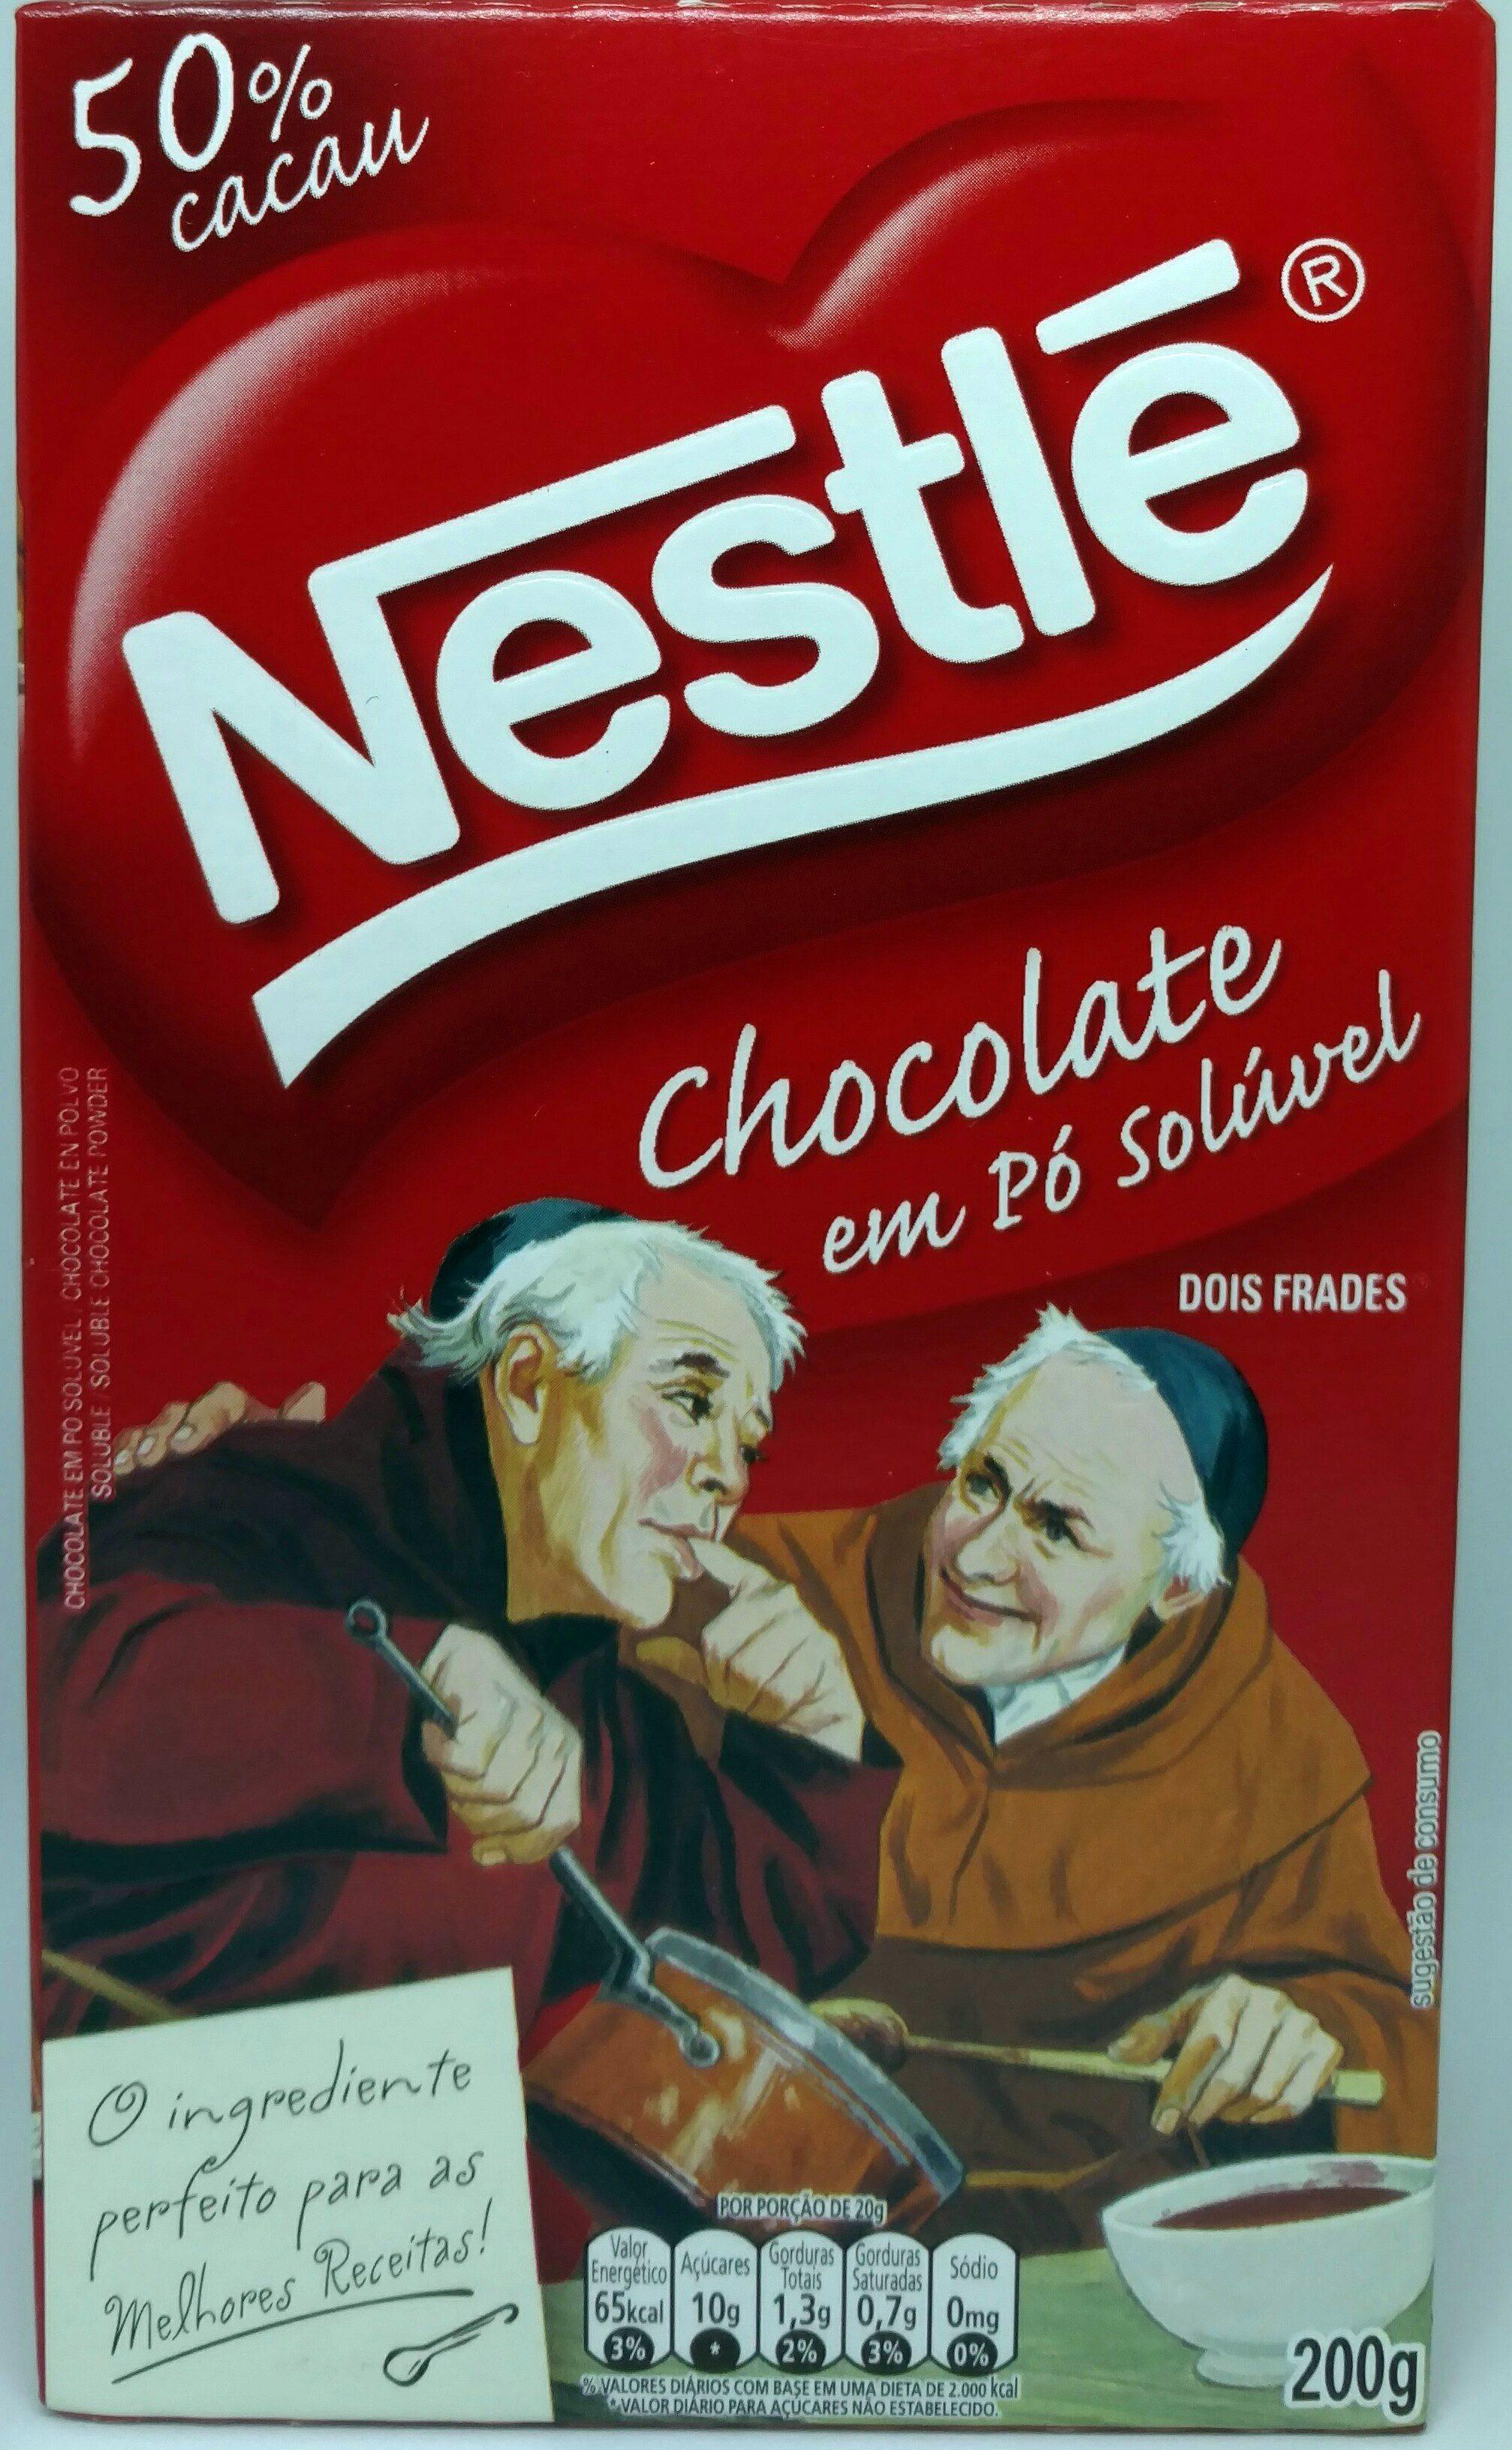 Chocolate em pó solúvel Dois frades - Product